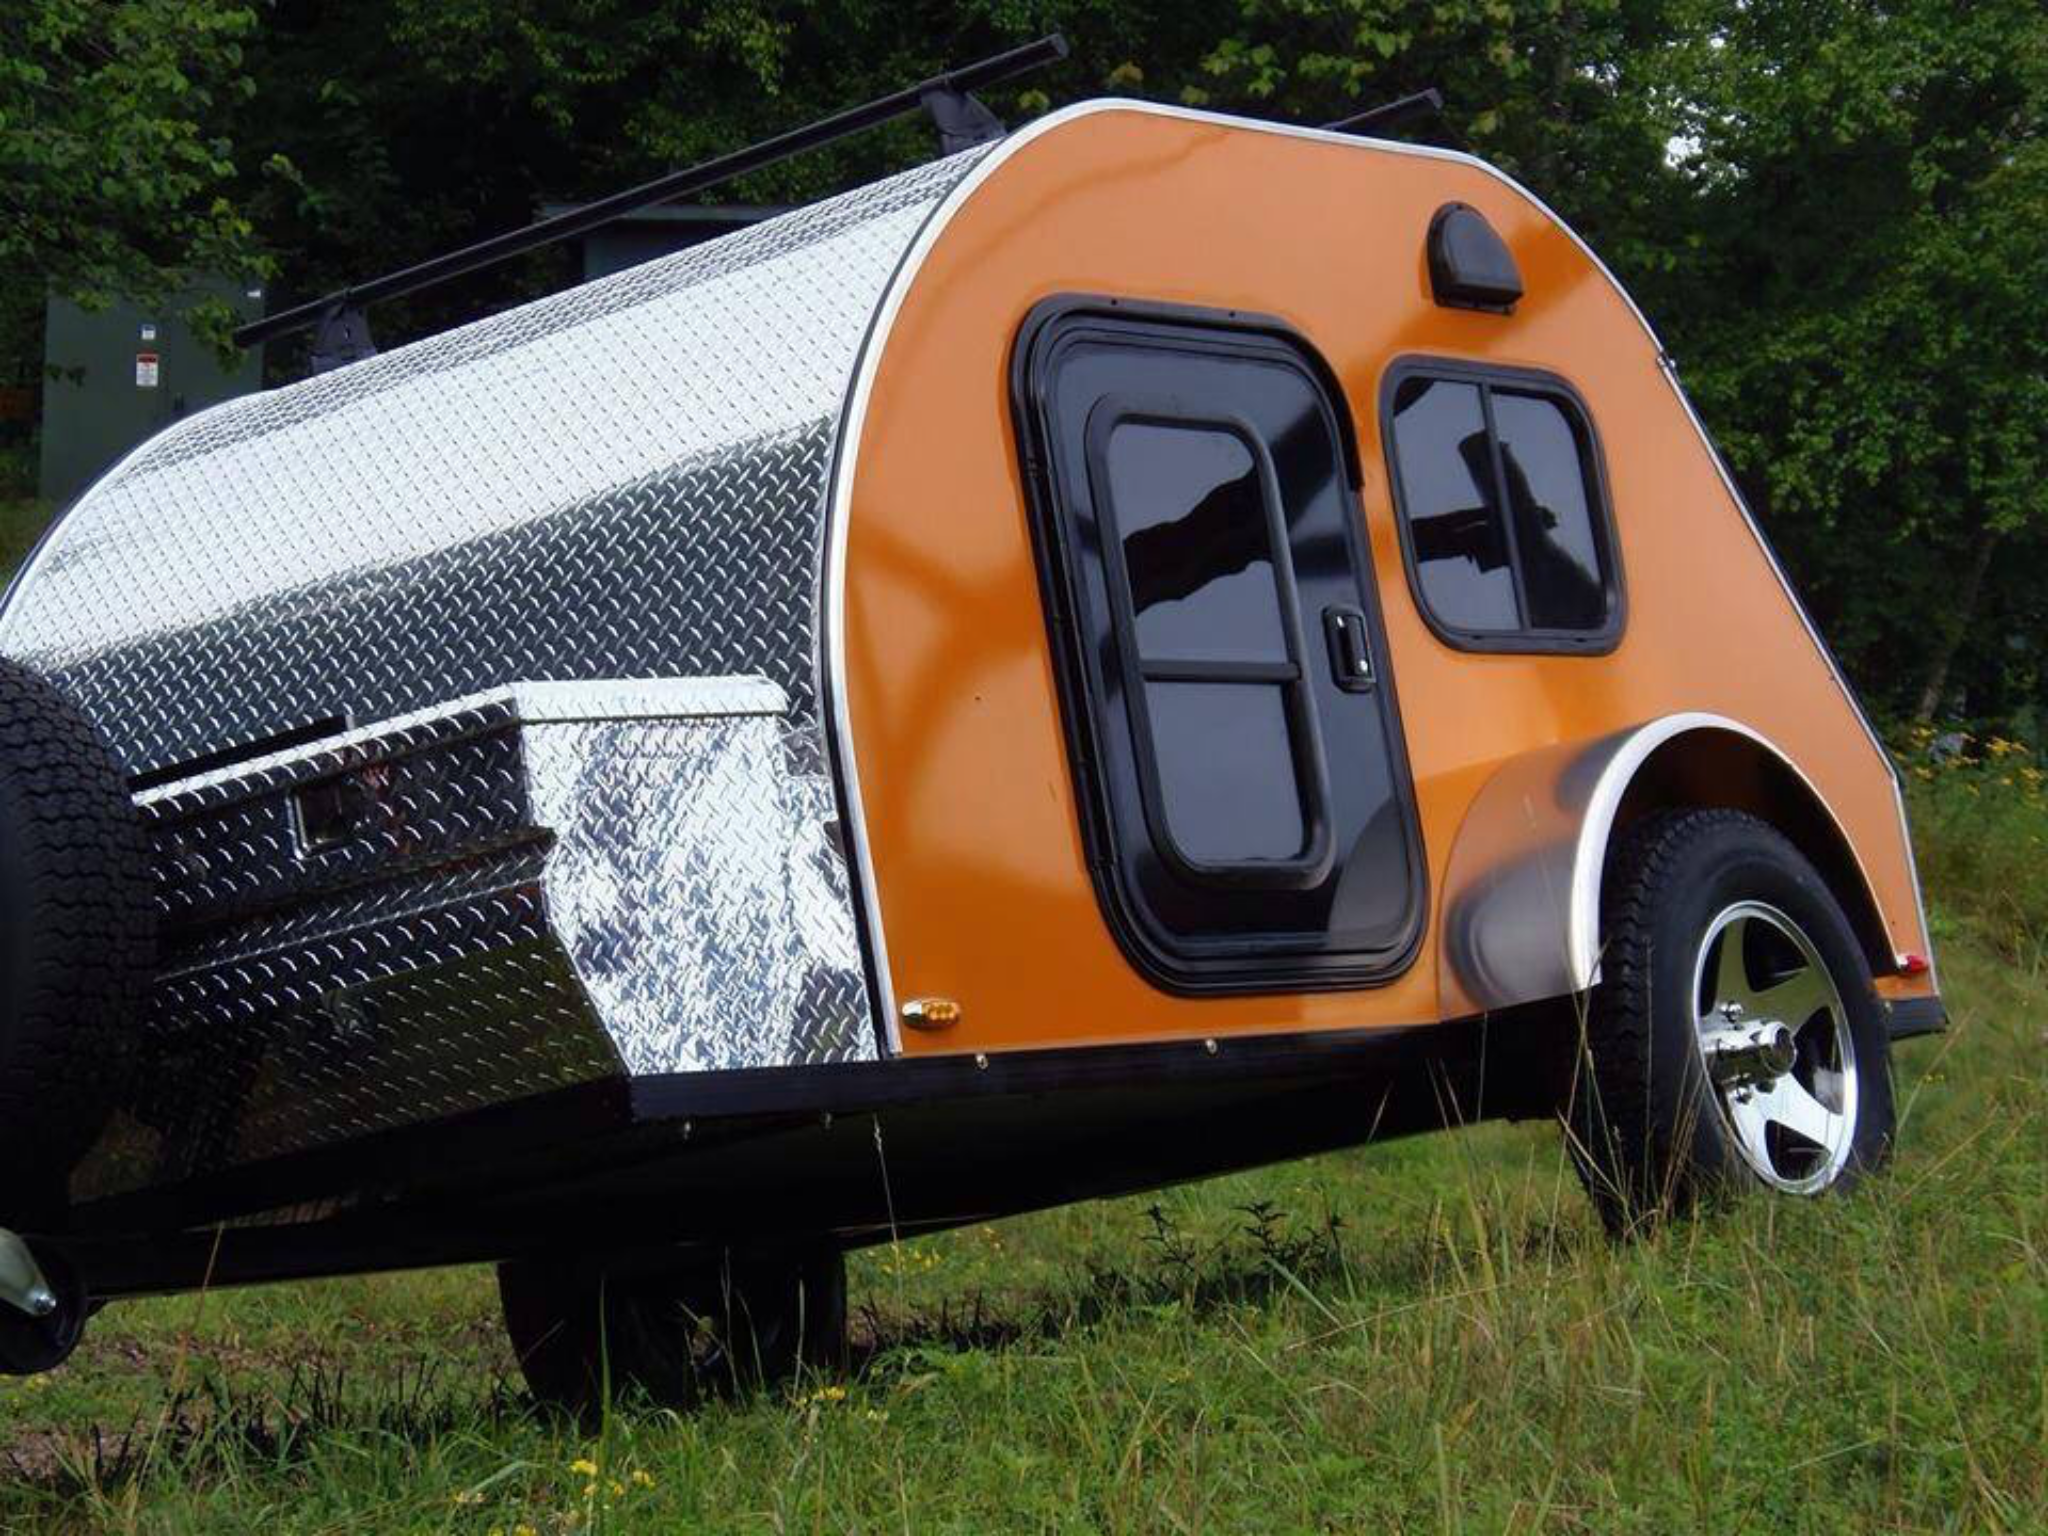 Pin de Rentmyhusband en LT\'s Camper Build | Pinterest